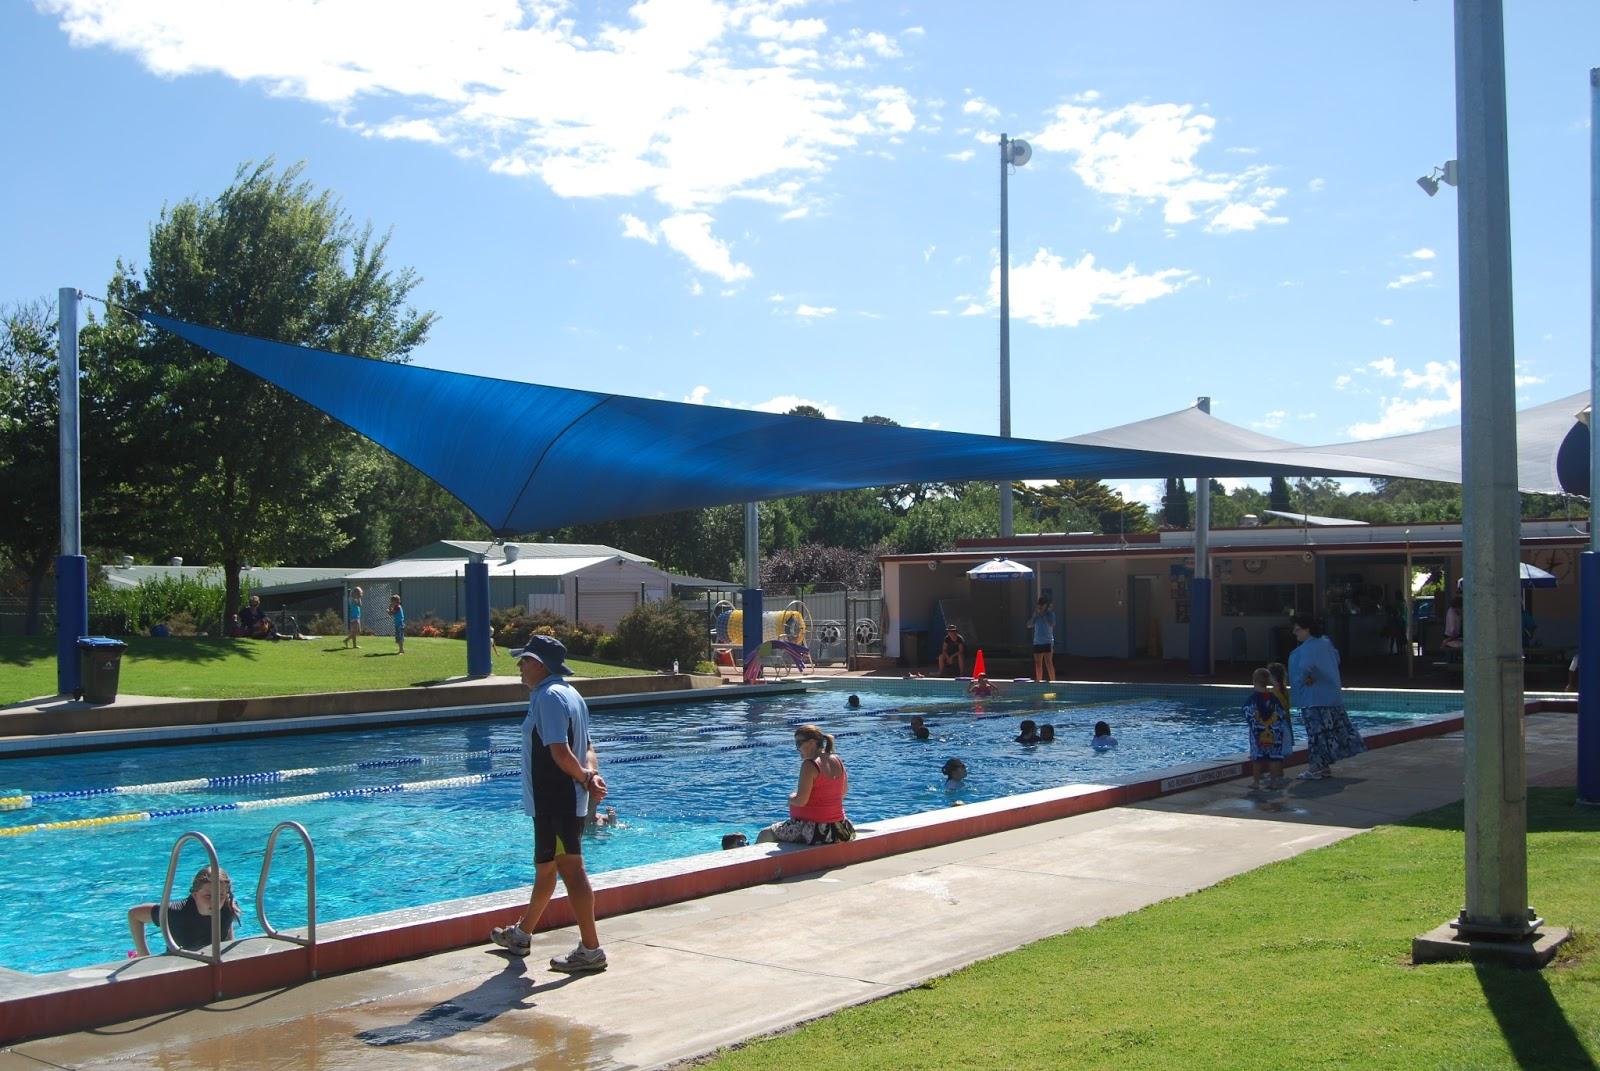 Swimming pool shade in dubai abu dhabi uae - Swimming pool construction companies in uae ...